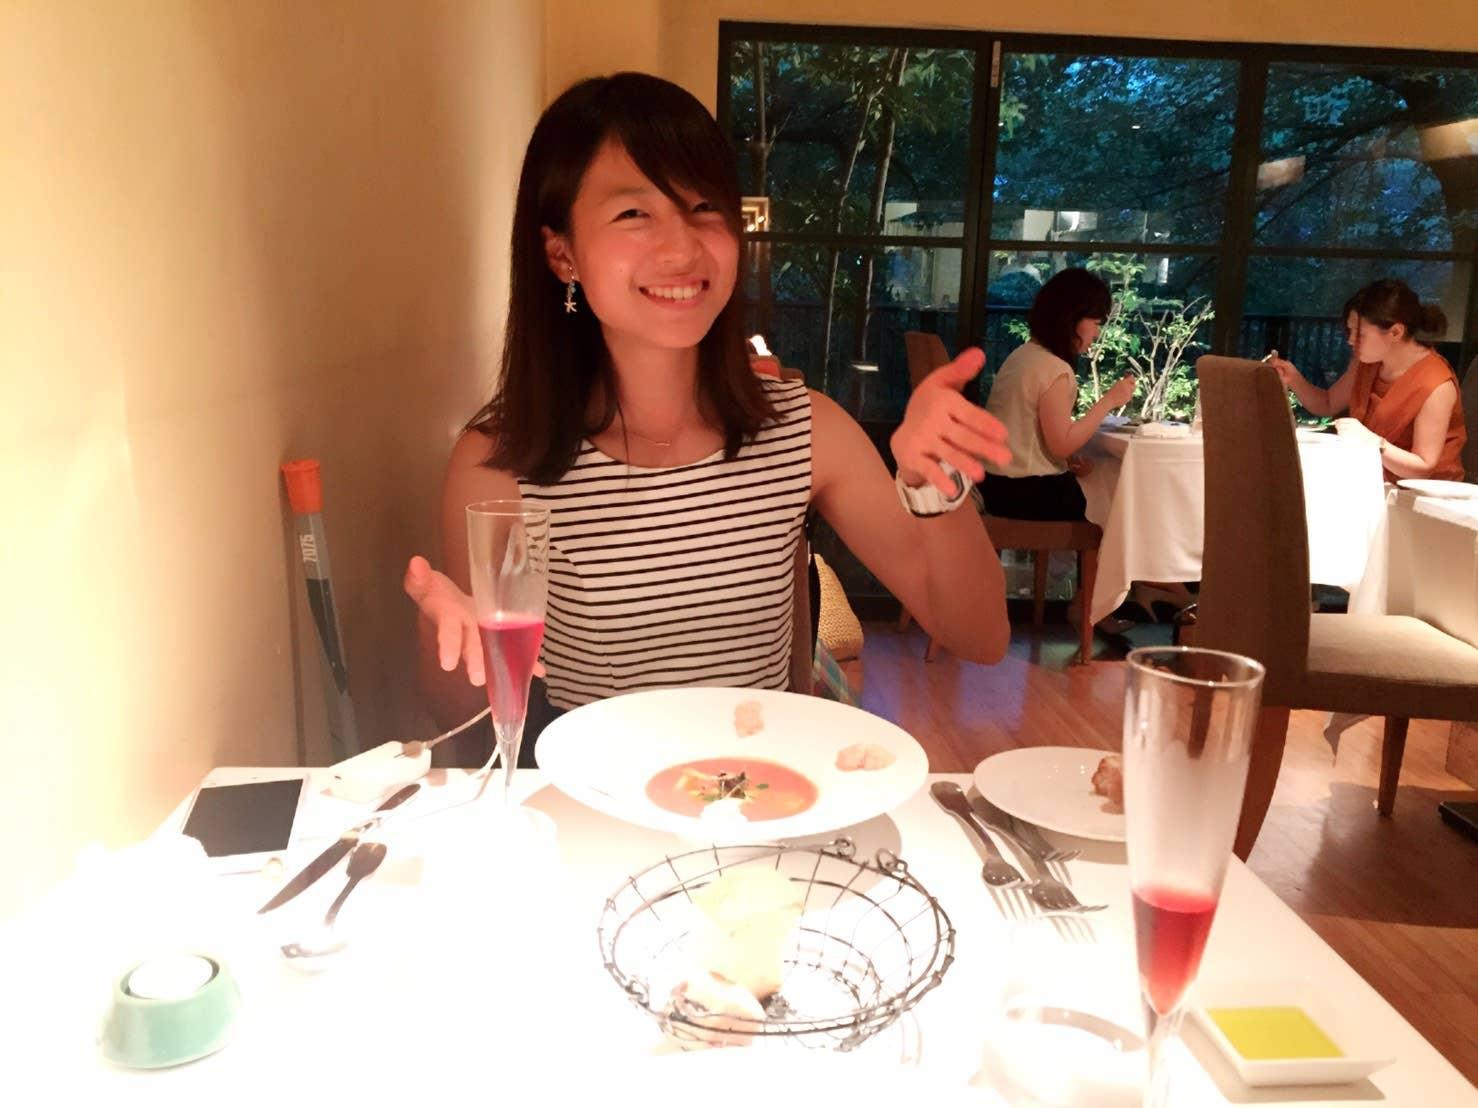 Risa Nagashima